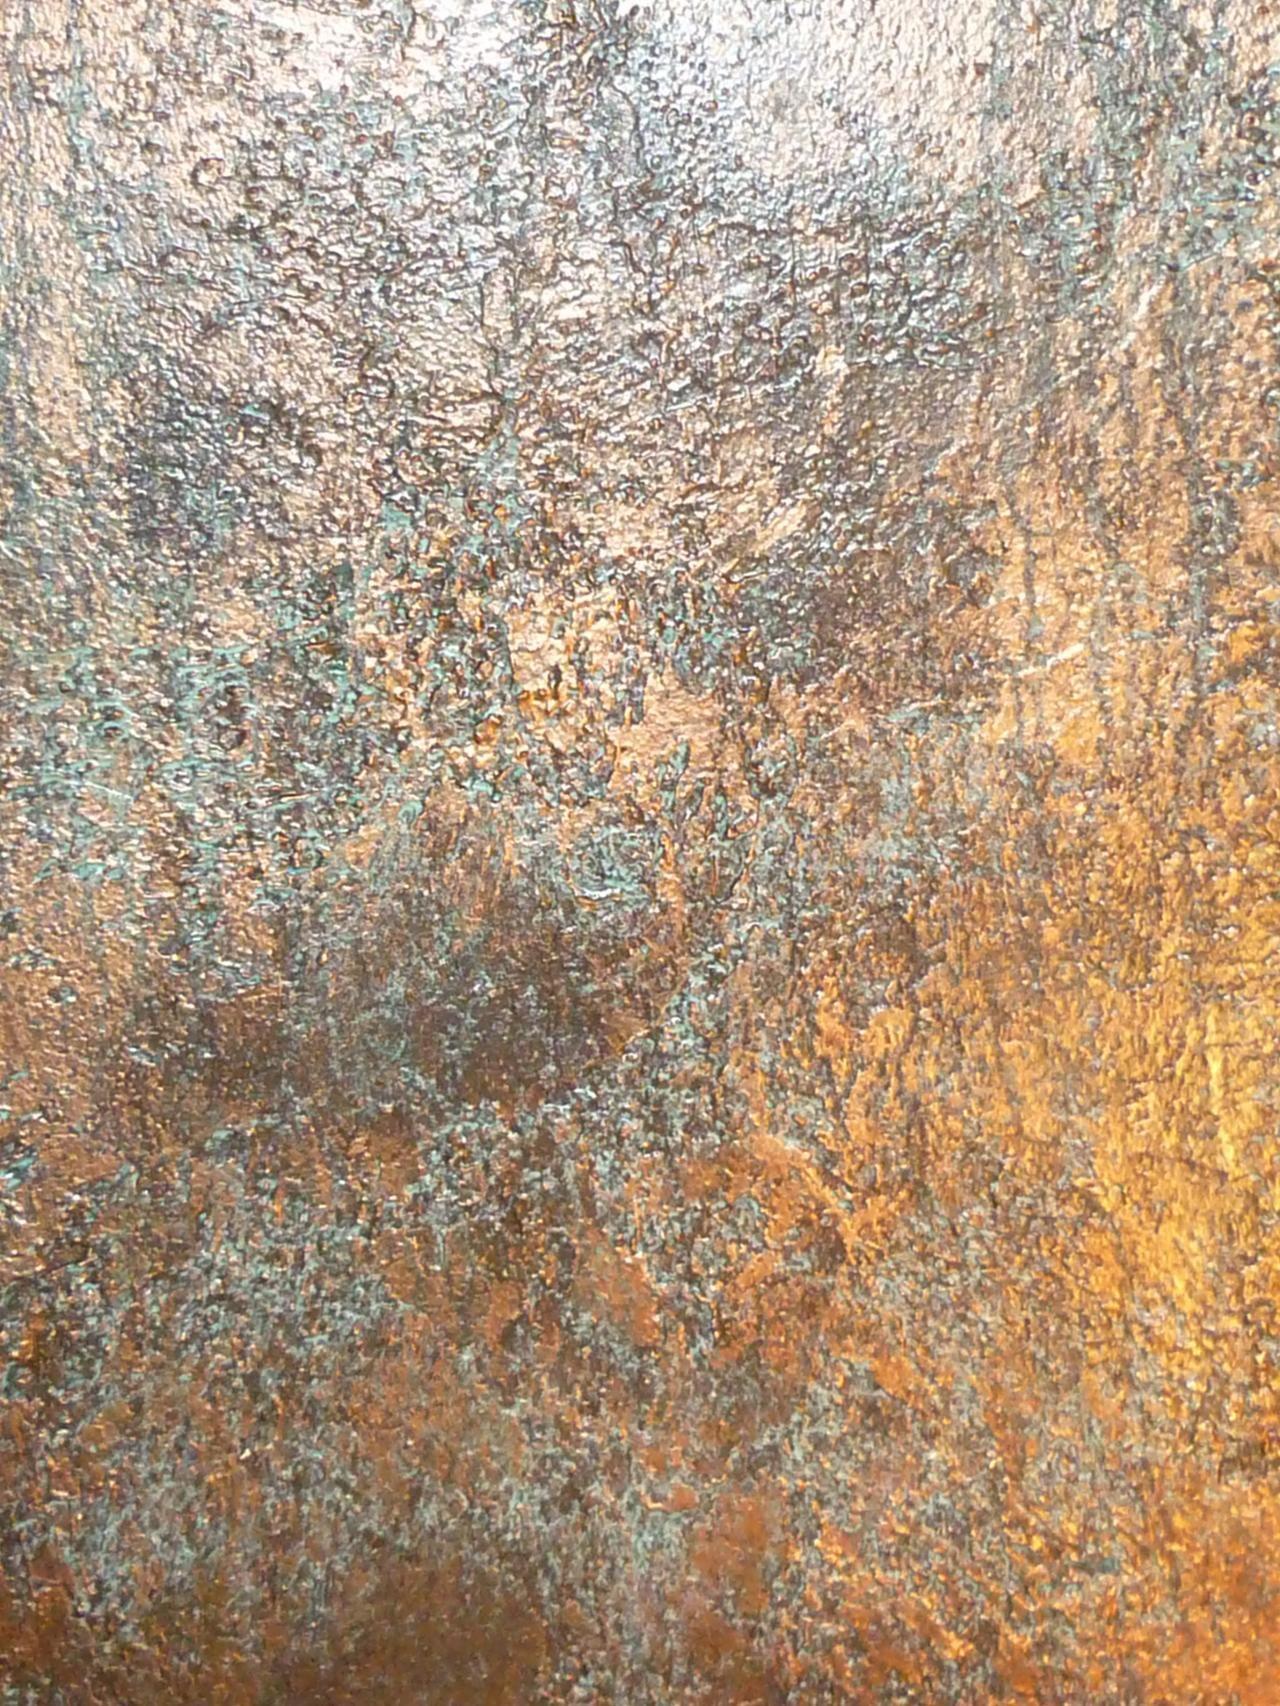 Pangea Tiling & Decorative Painting - Decorative Paint & Faux FinishingBeforeAfter